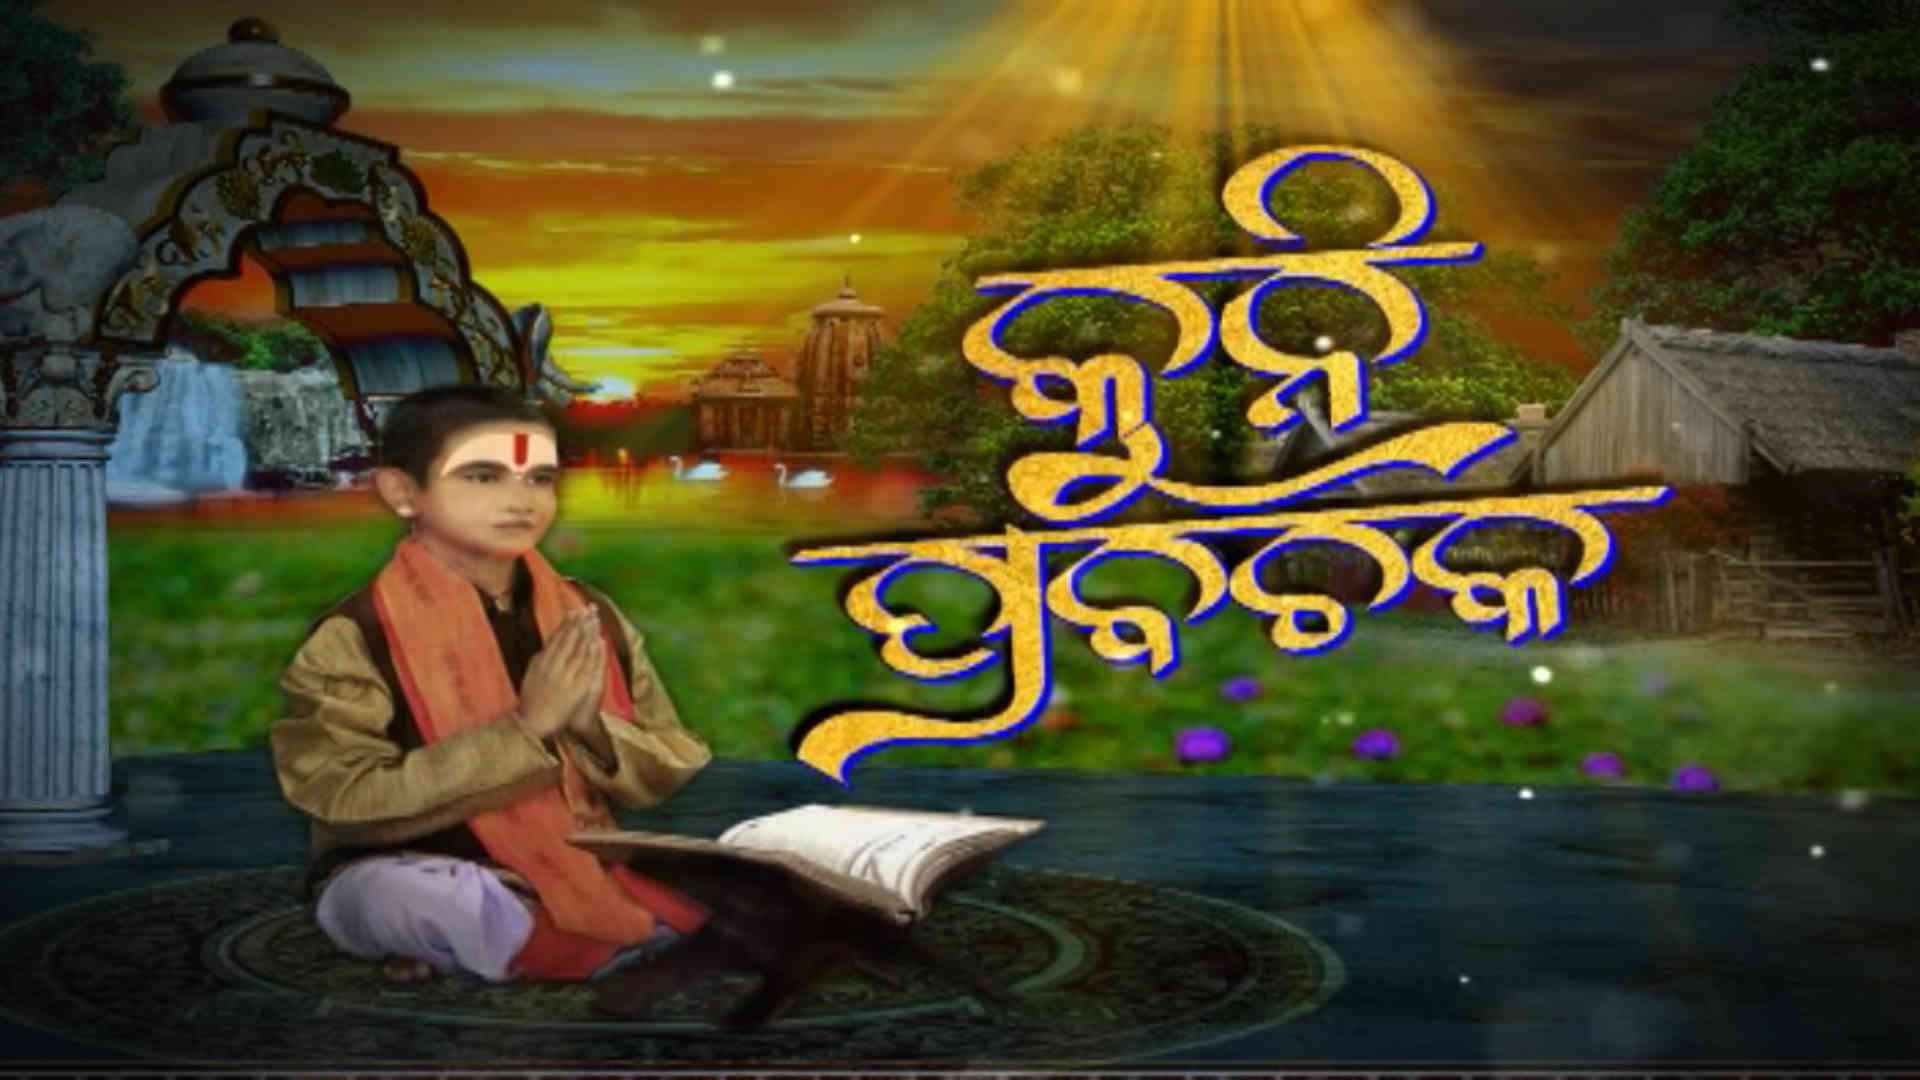 Kuni Prabachaka